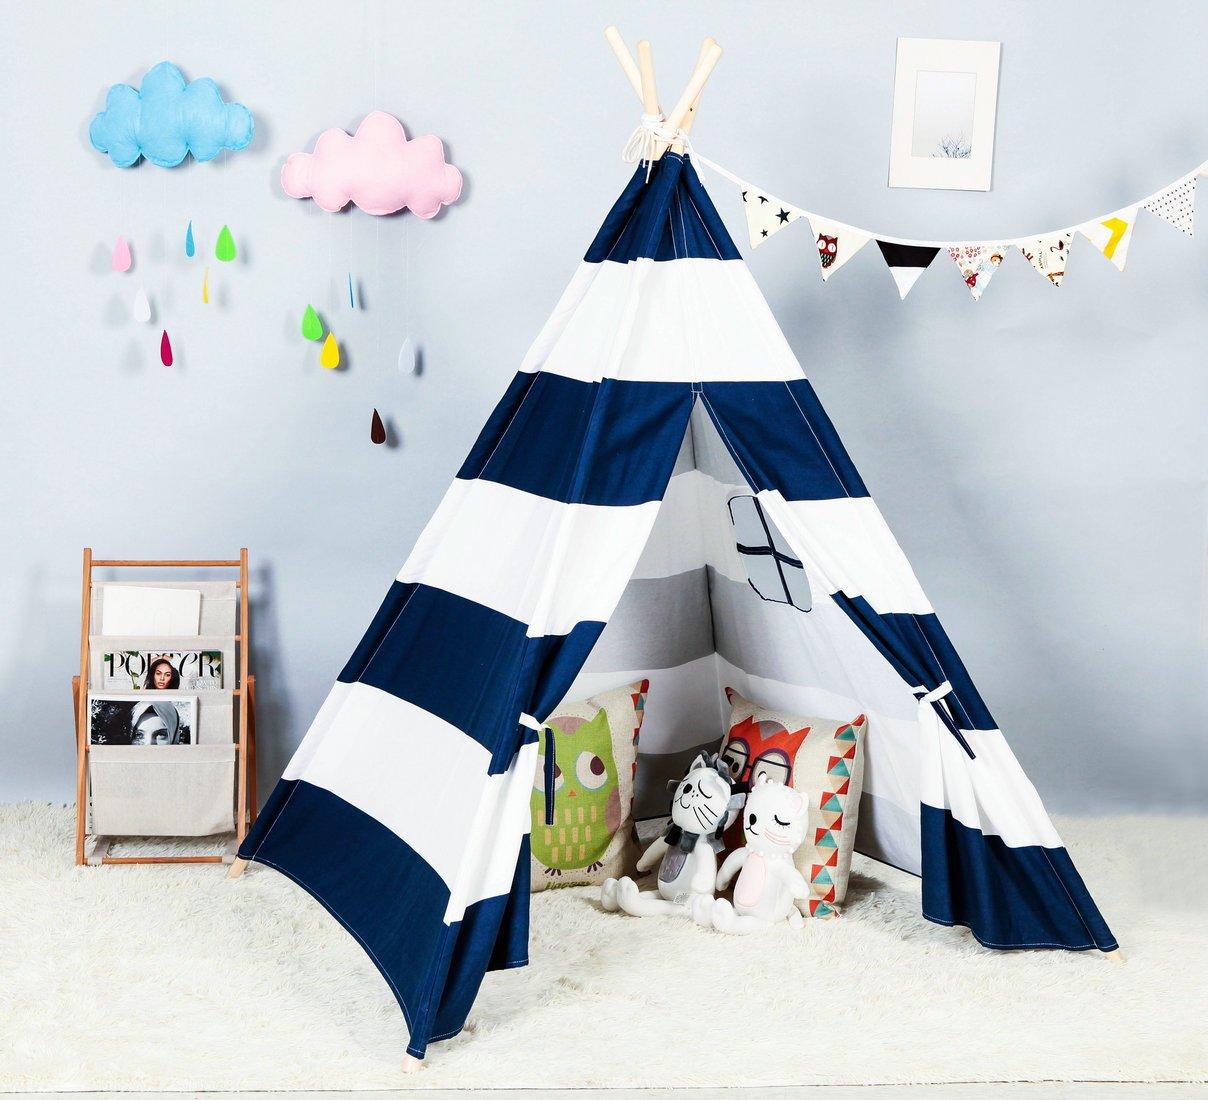 [Steegic]Steegic Foldable Cotton Canvas Indian Teepee Kid Play Tent for Children PlayhouseBlue and White Stripe [並行輸入品] B01M5H2RQF